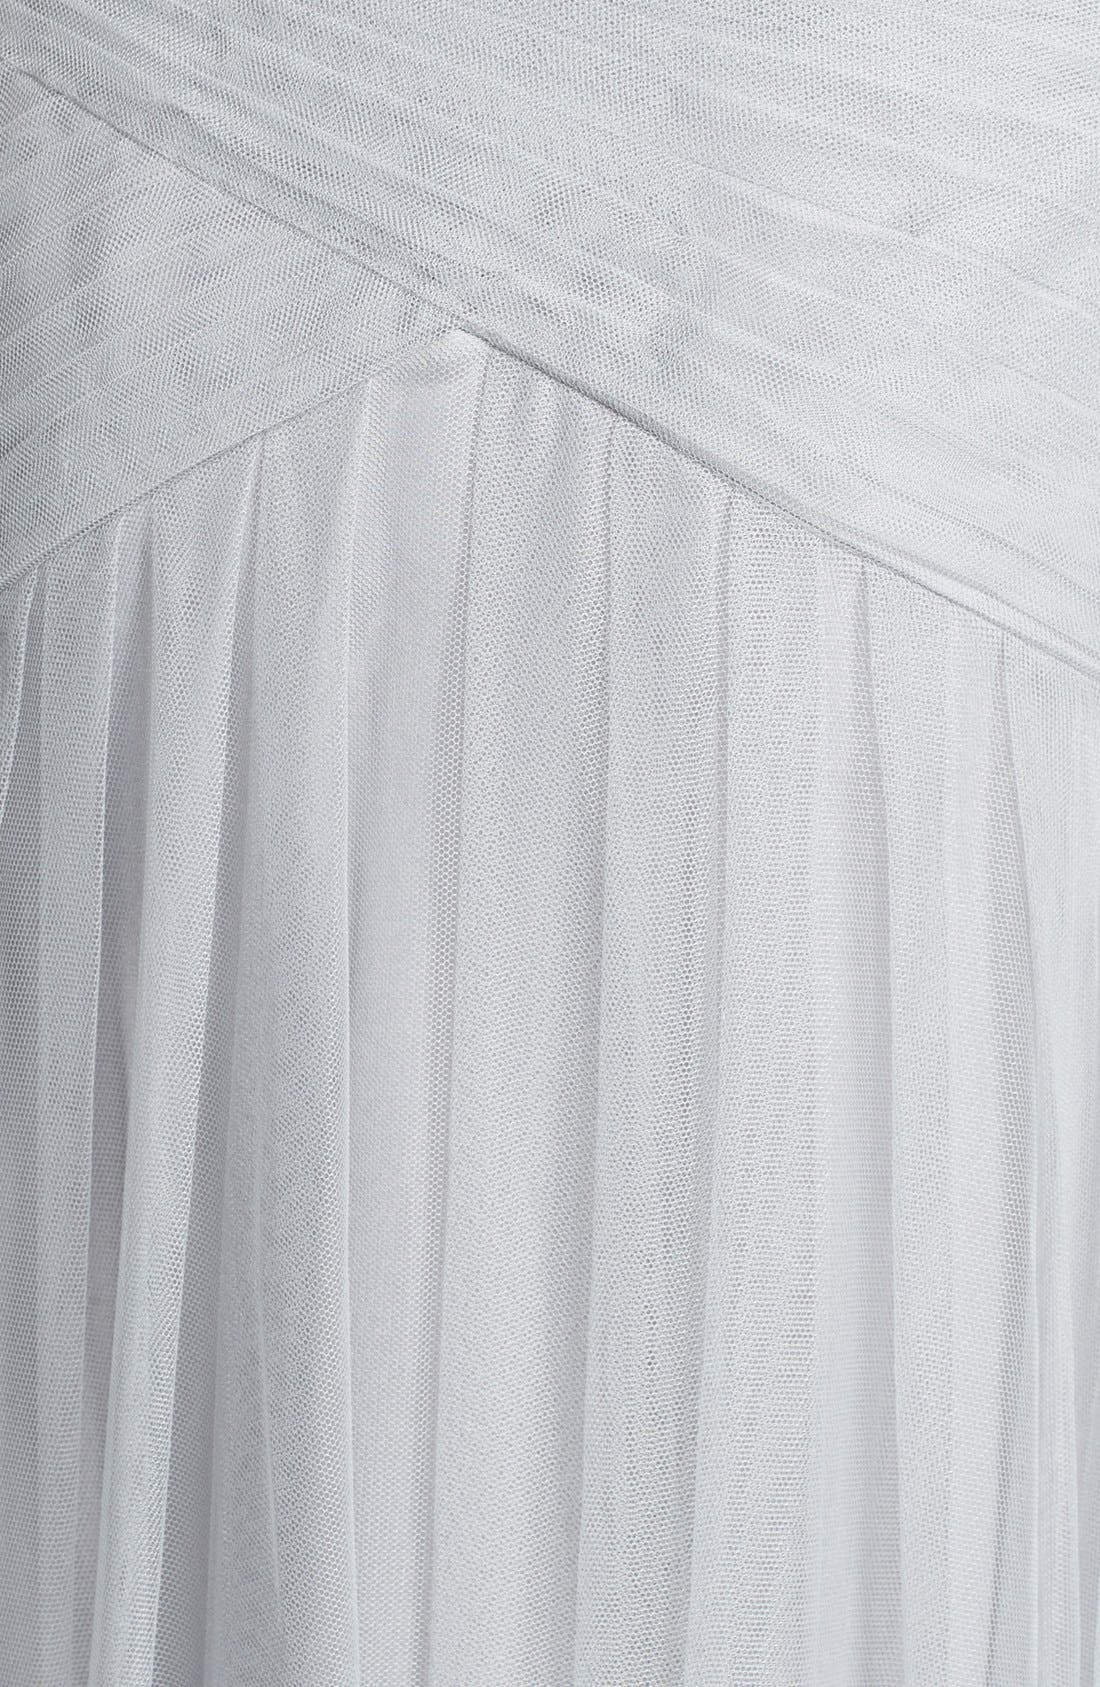 Alternate Image 3  - Monique Lhuillier Bridesmaids Pleated One-Shoulder Tulle Trumpet Gown